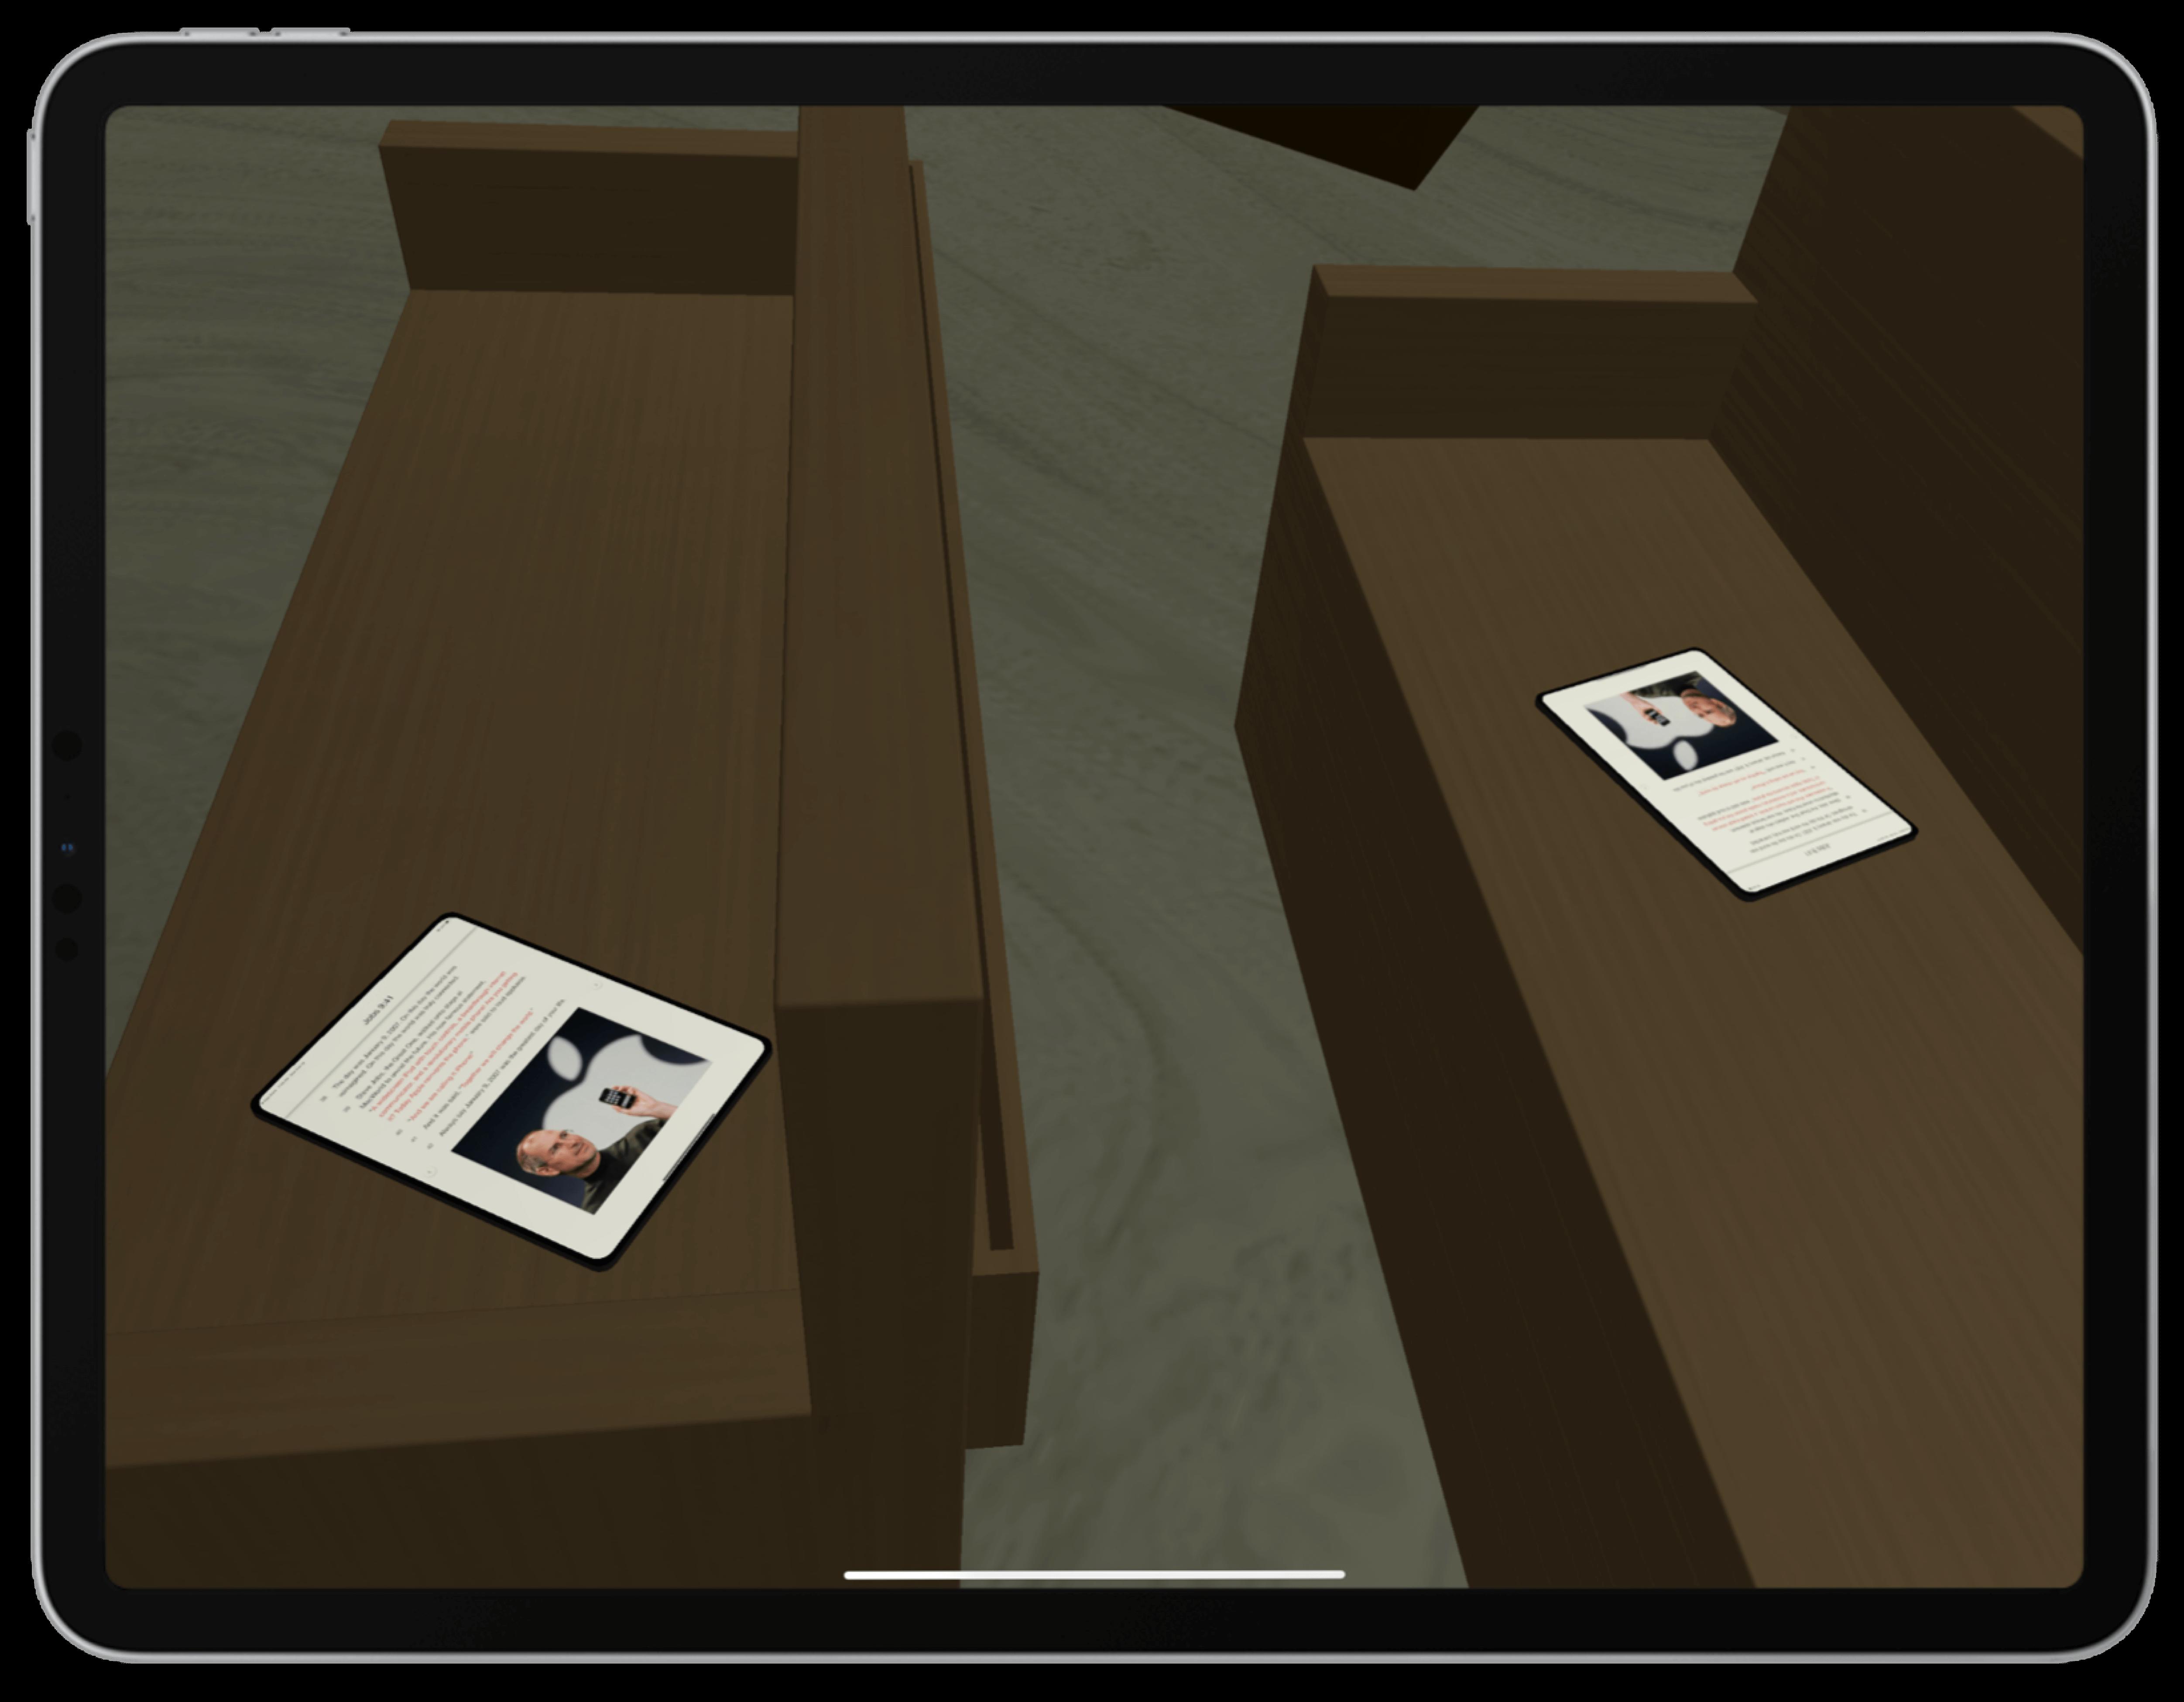 Apple Chapel Pews Screenshot | Toby Everett